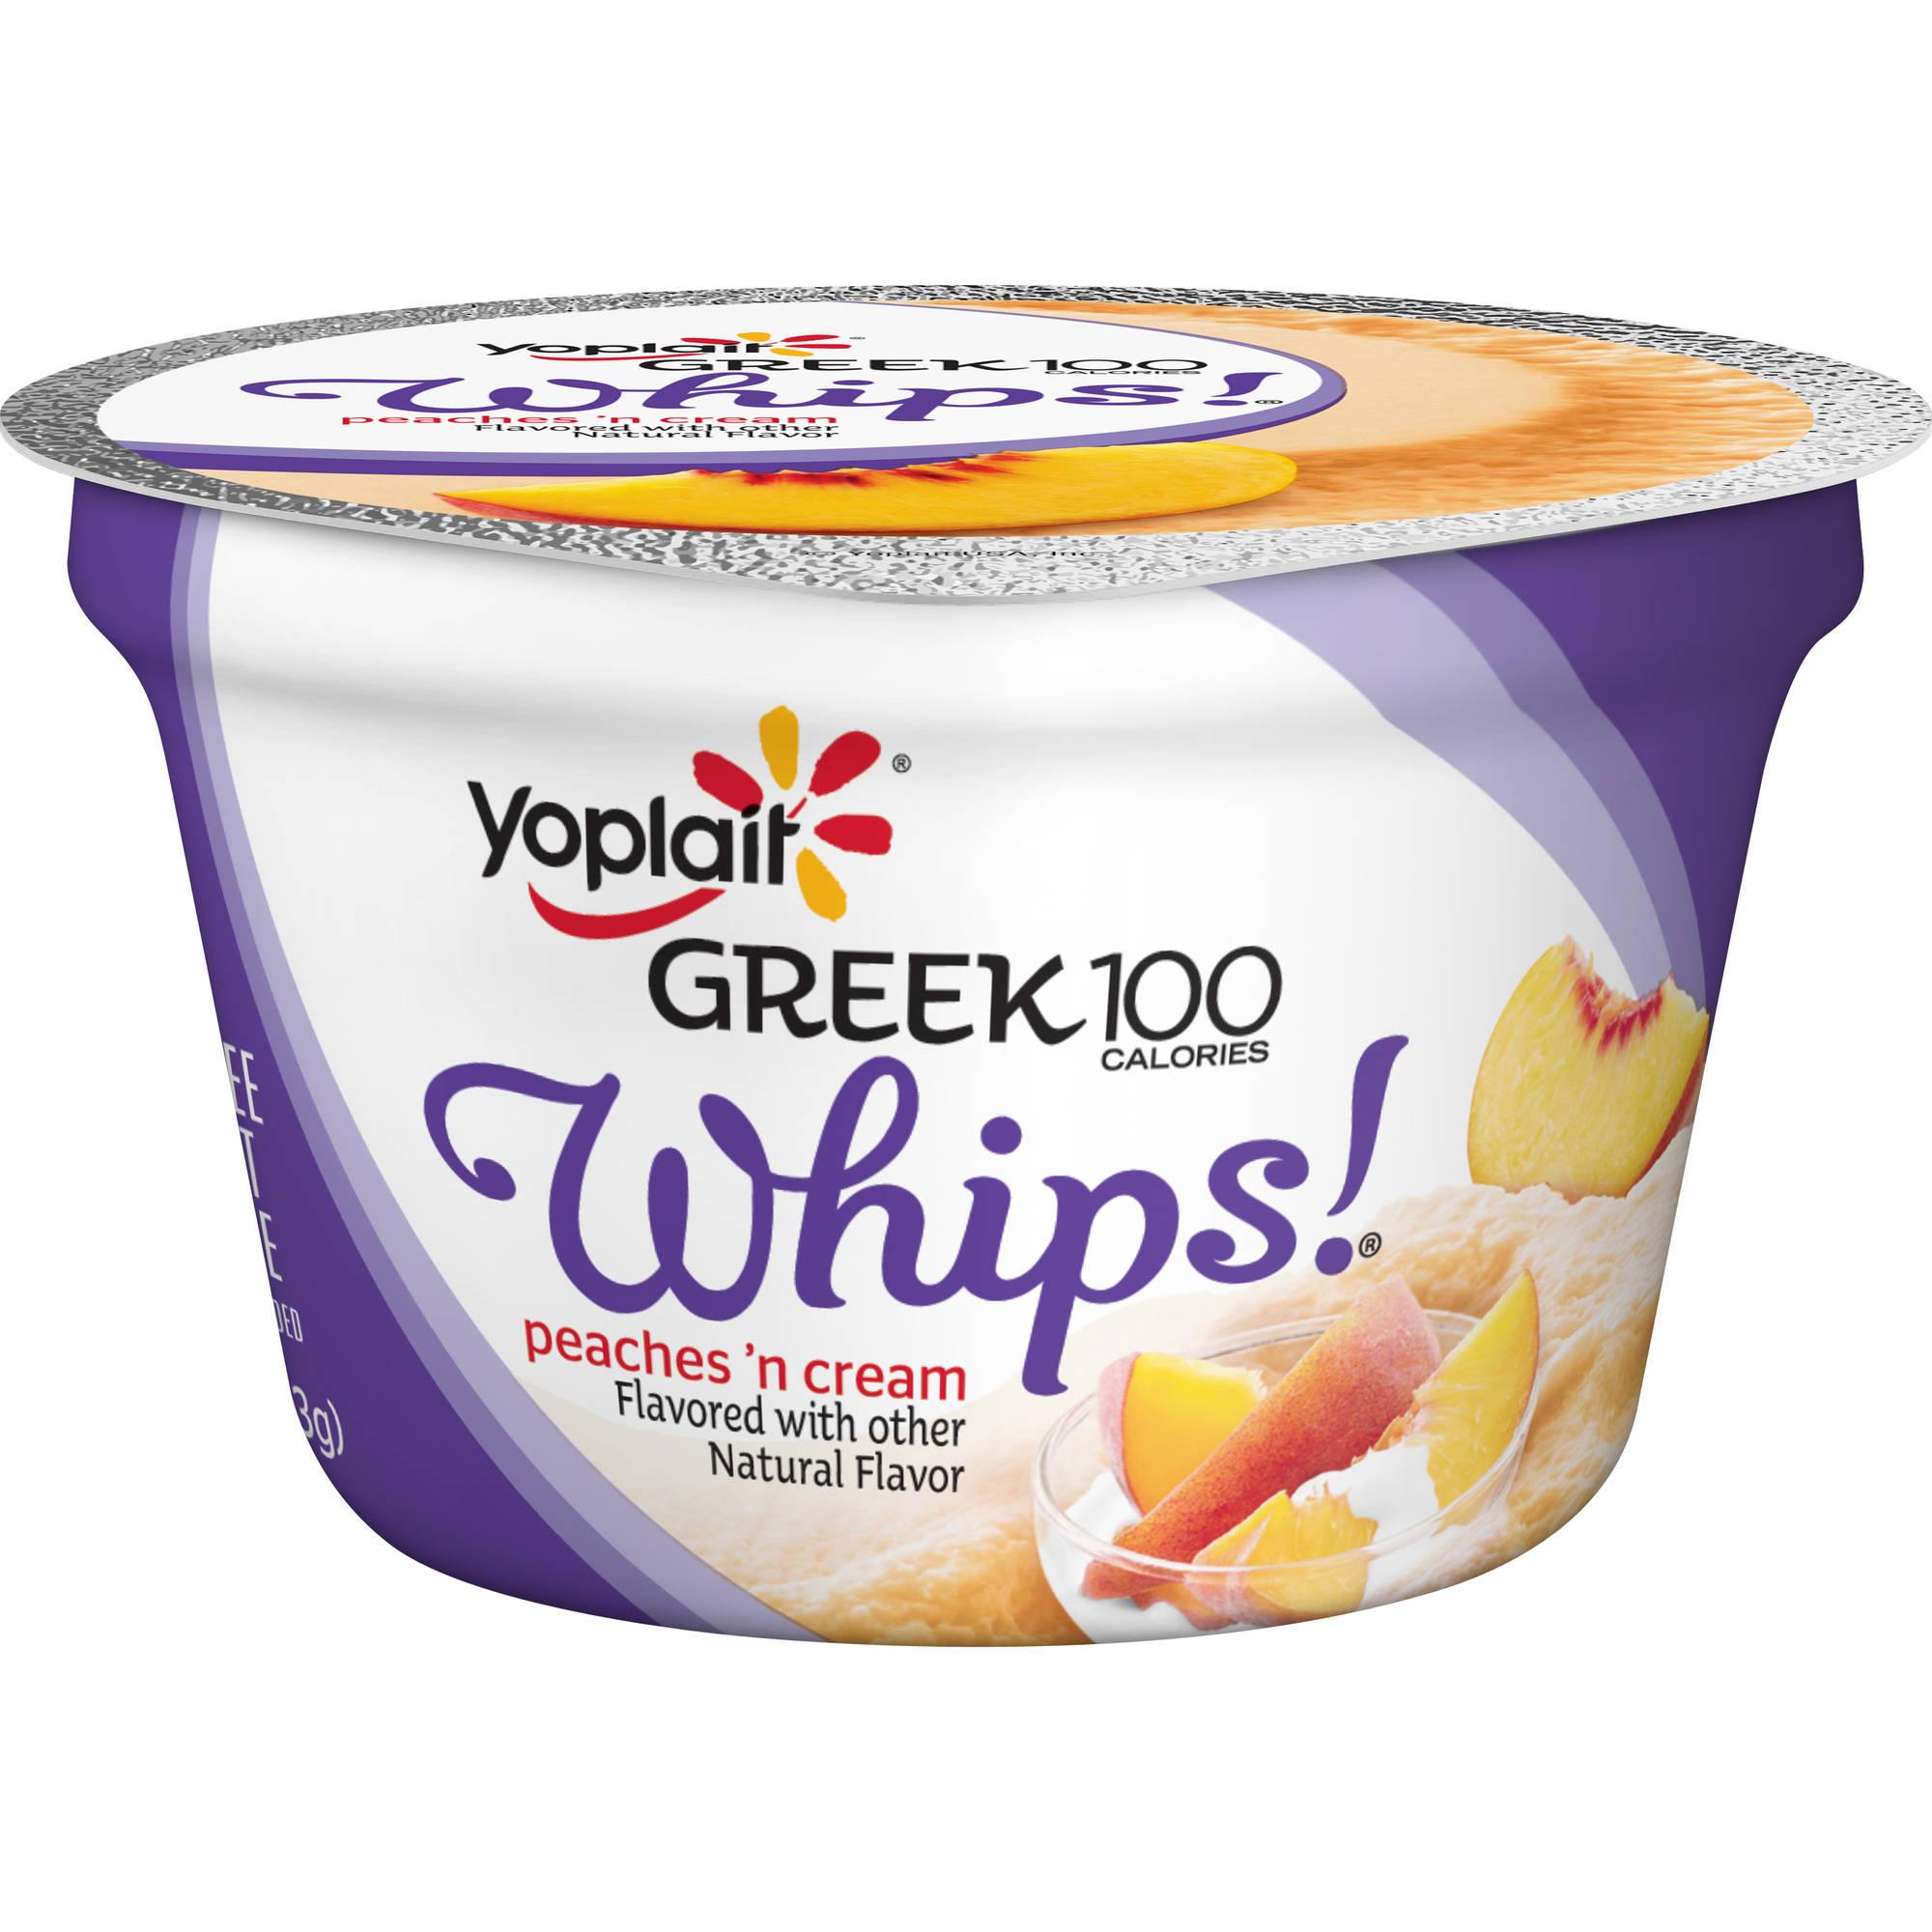 Yoplait Greek 100 Calories Whips! Peaches 'n Cream Fat Free Yogurt Mousse, 4 oz